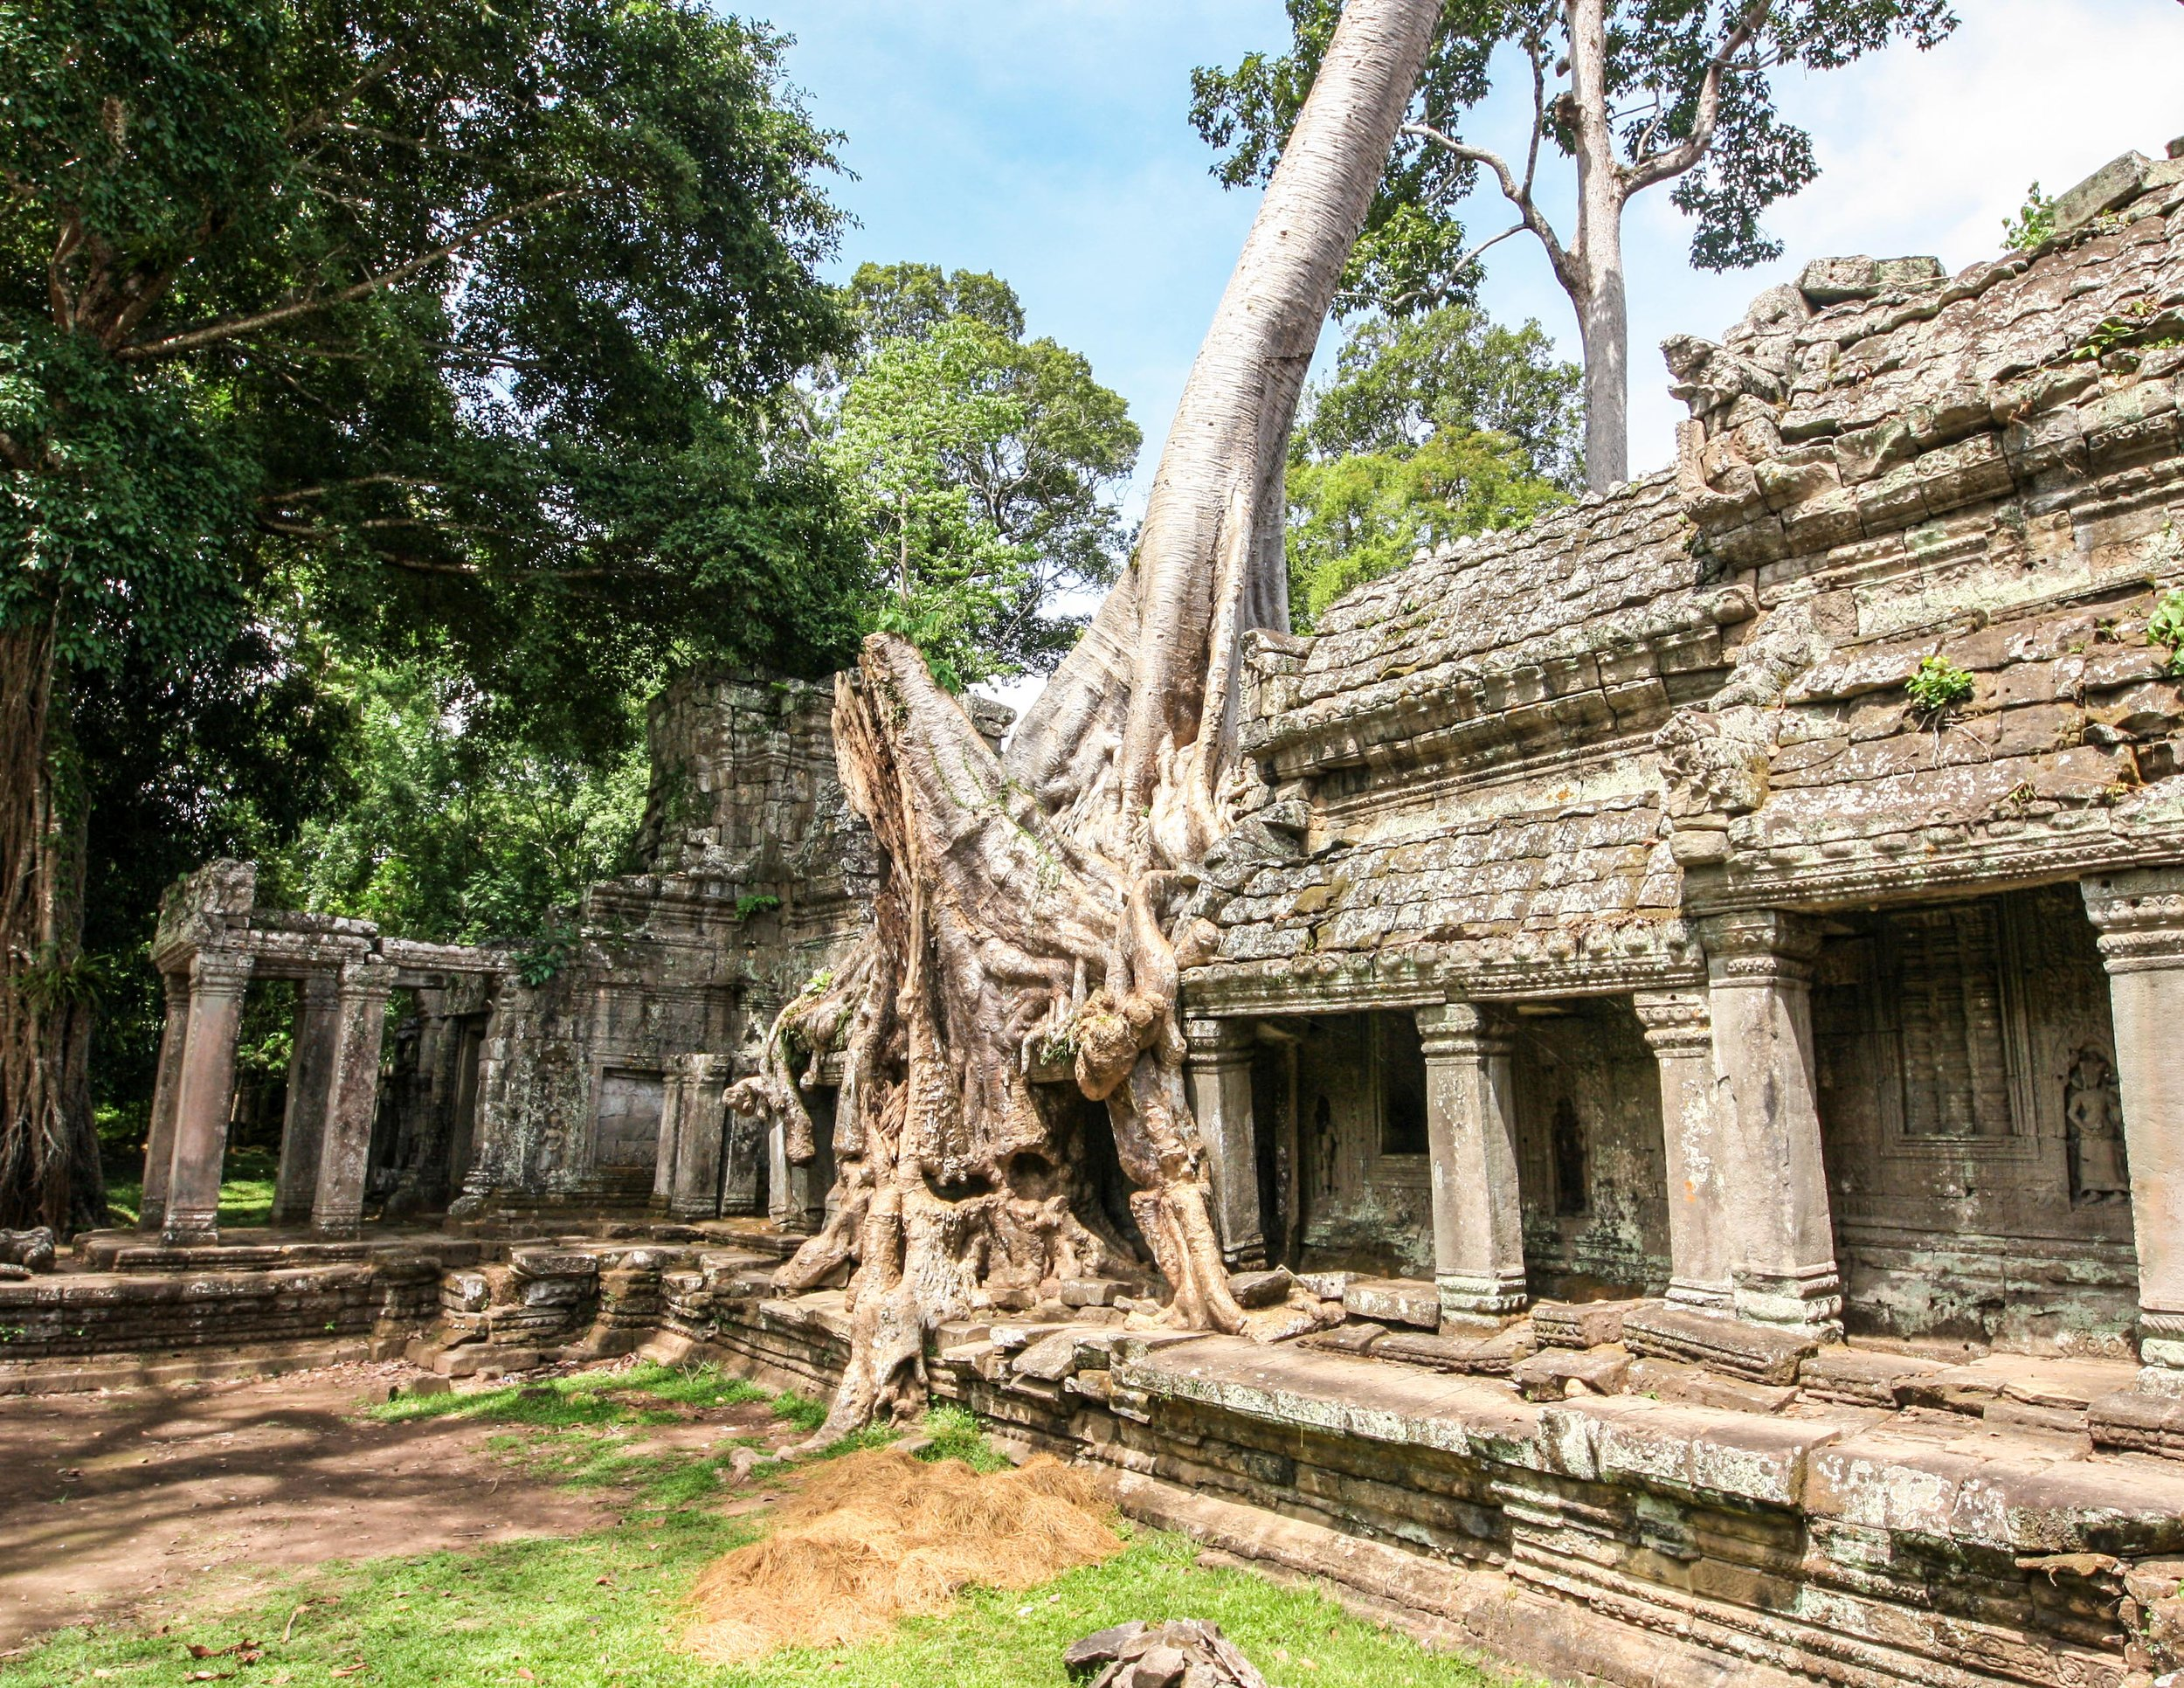 Cambodia Itinerary: Preah Kahn